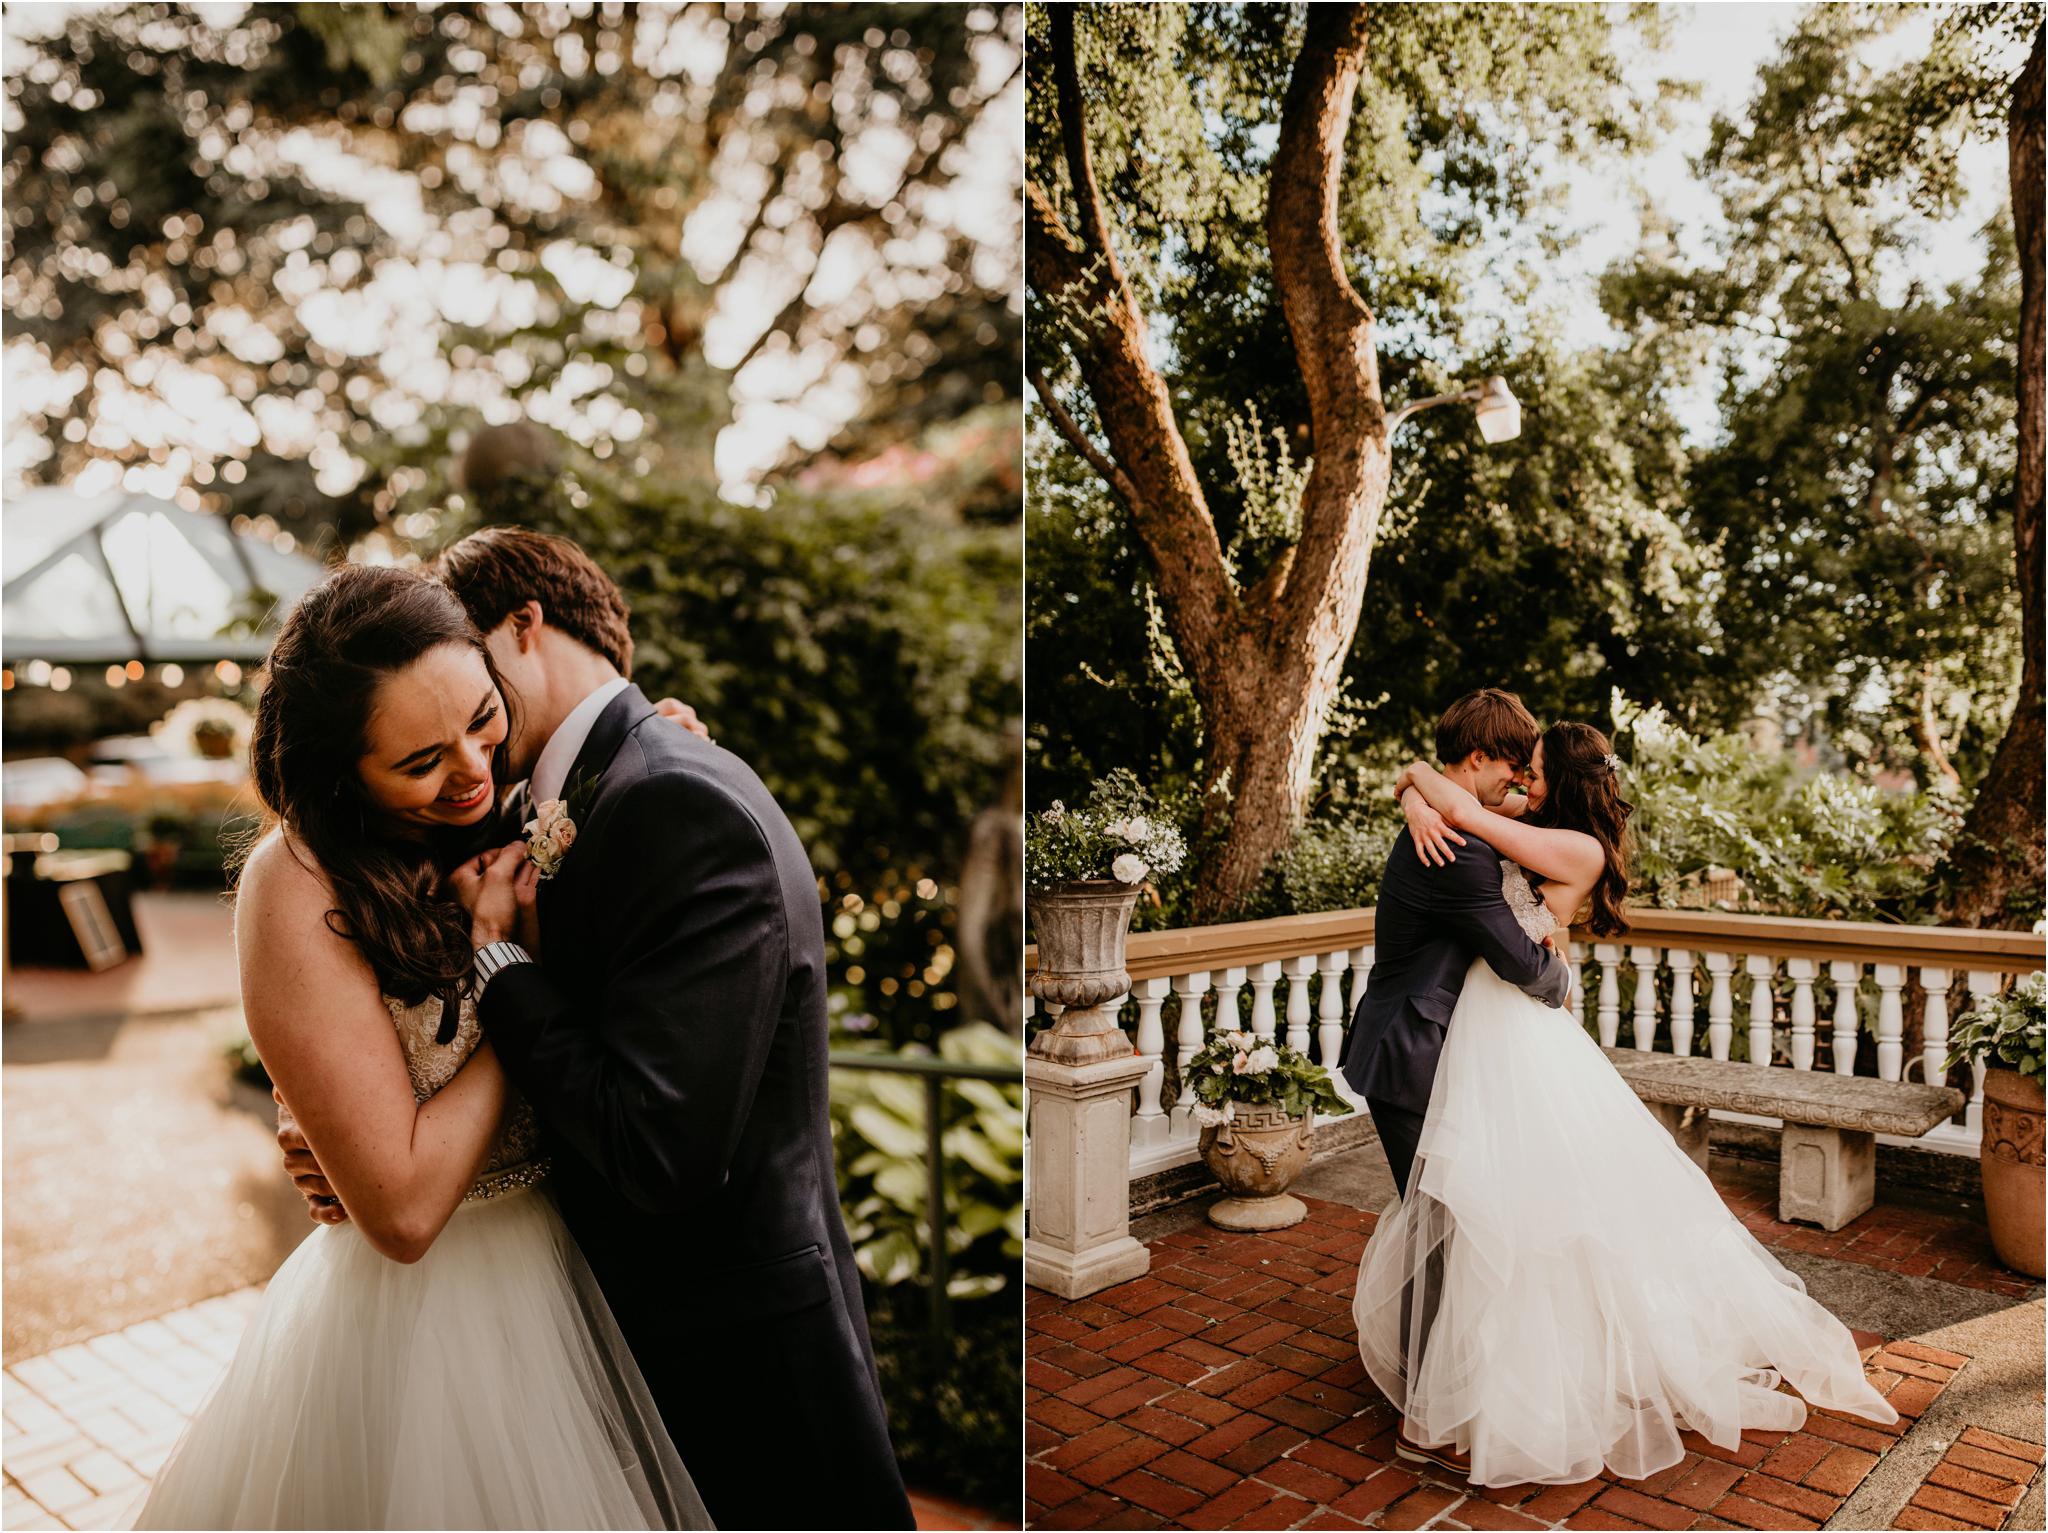 chance-and-ondrea-lairmont-manor-wedding-seattle-photographer-117.jpg